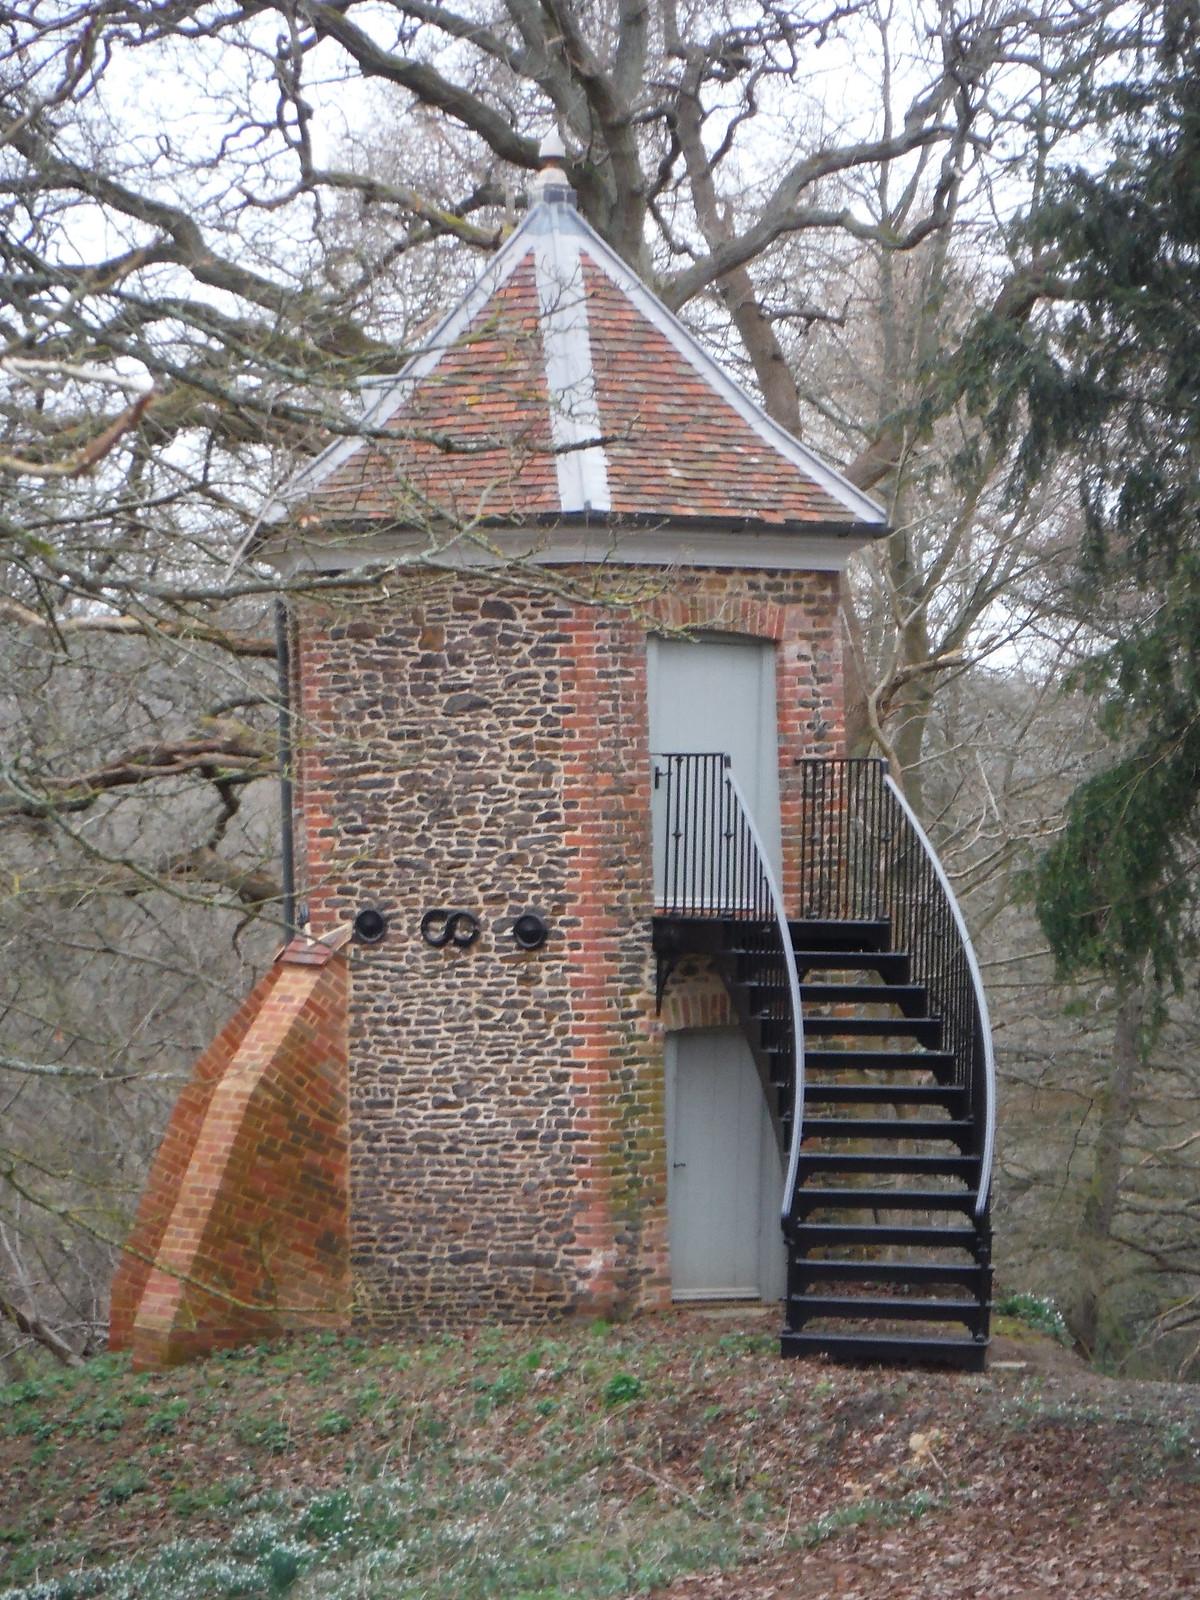 Hexagonal 'Dovecote', Tilhill House SWC Walk 144 Haslemere to Farnham